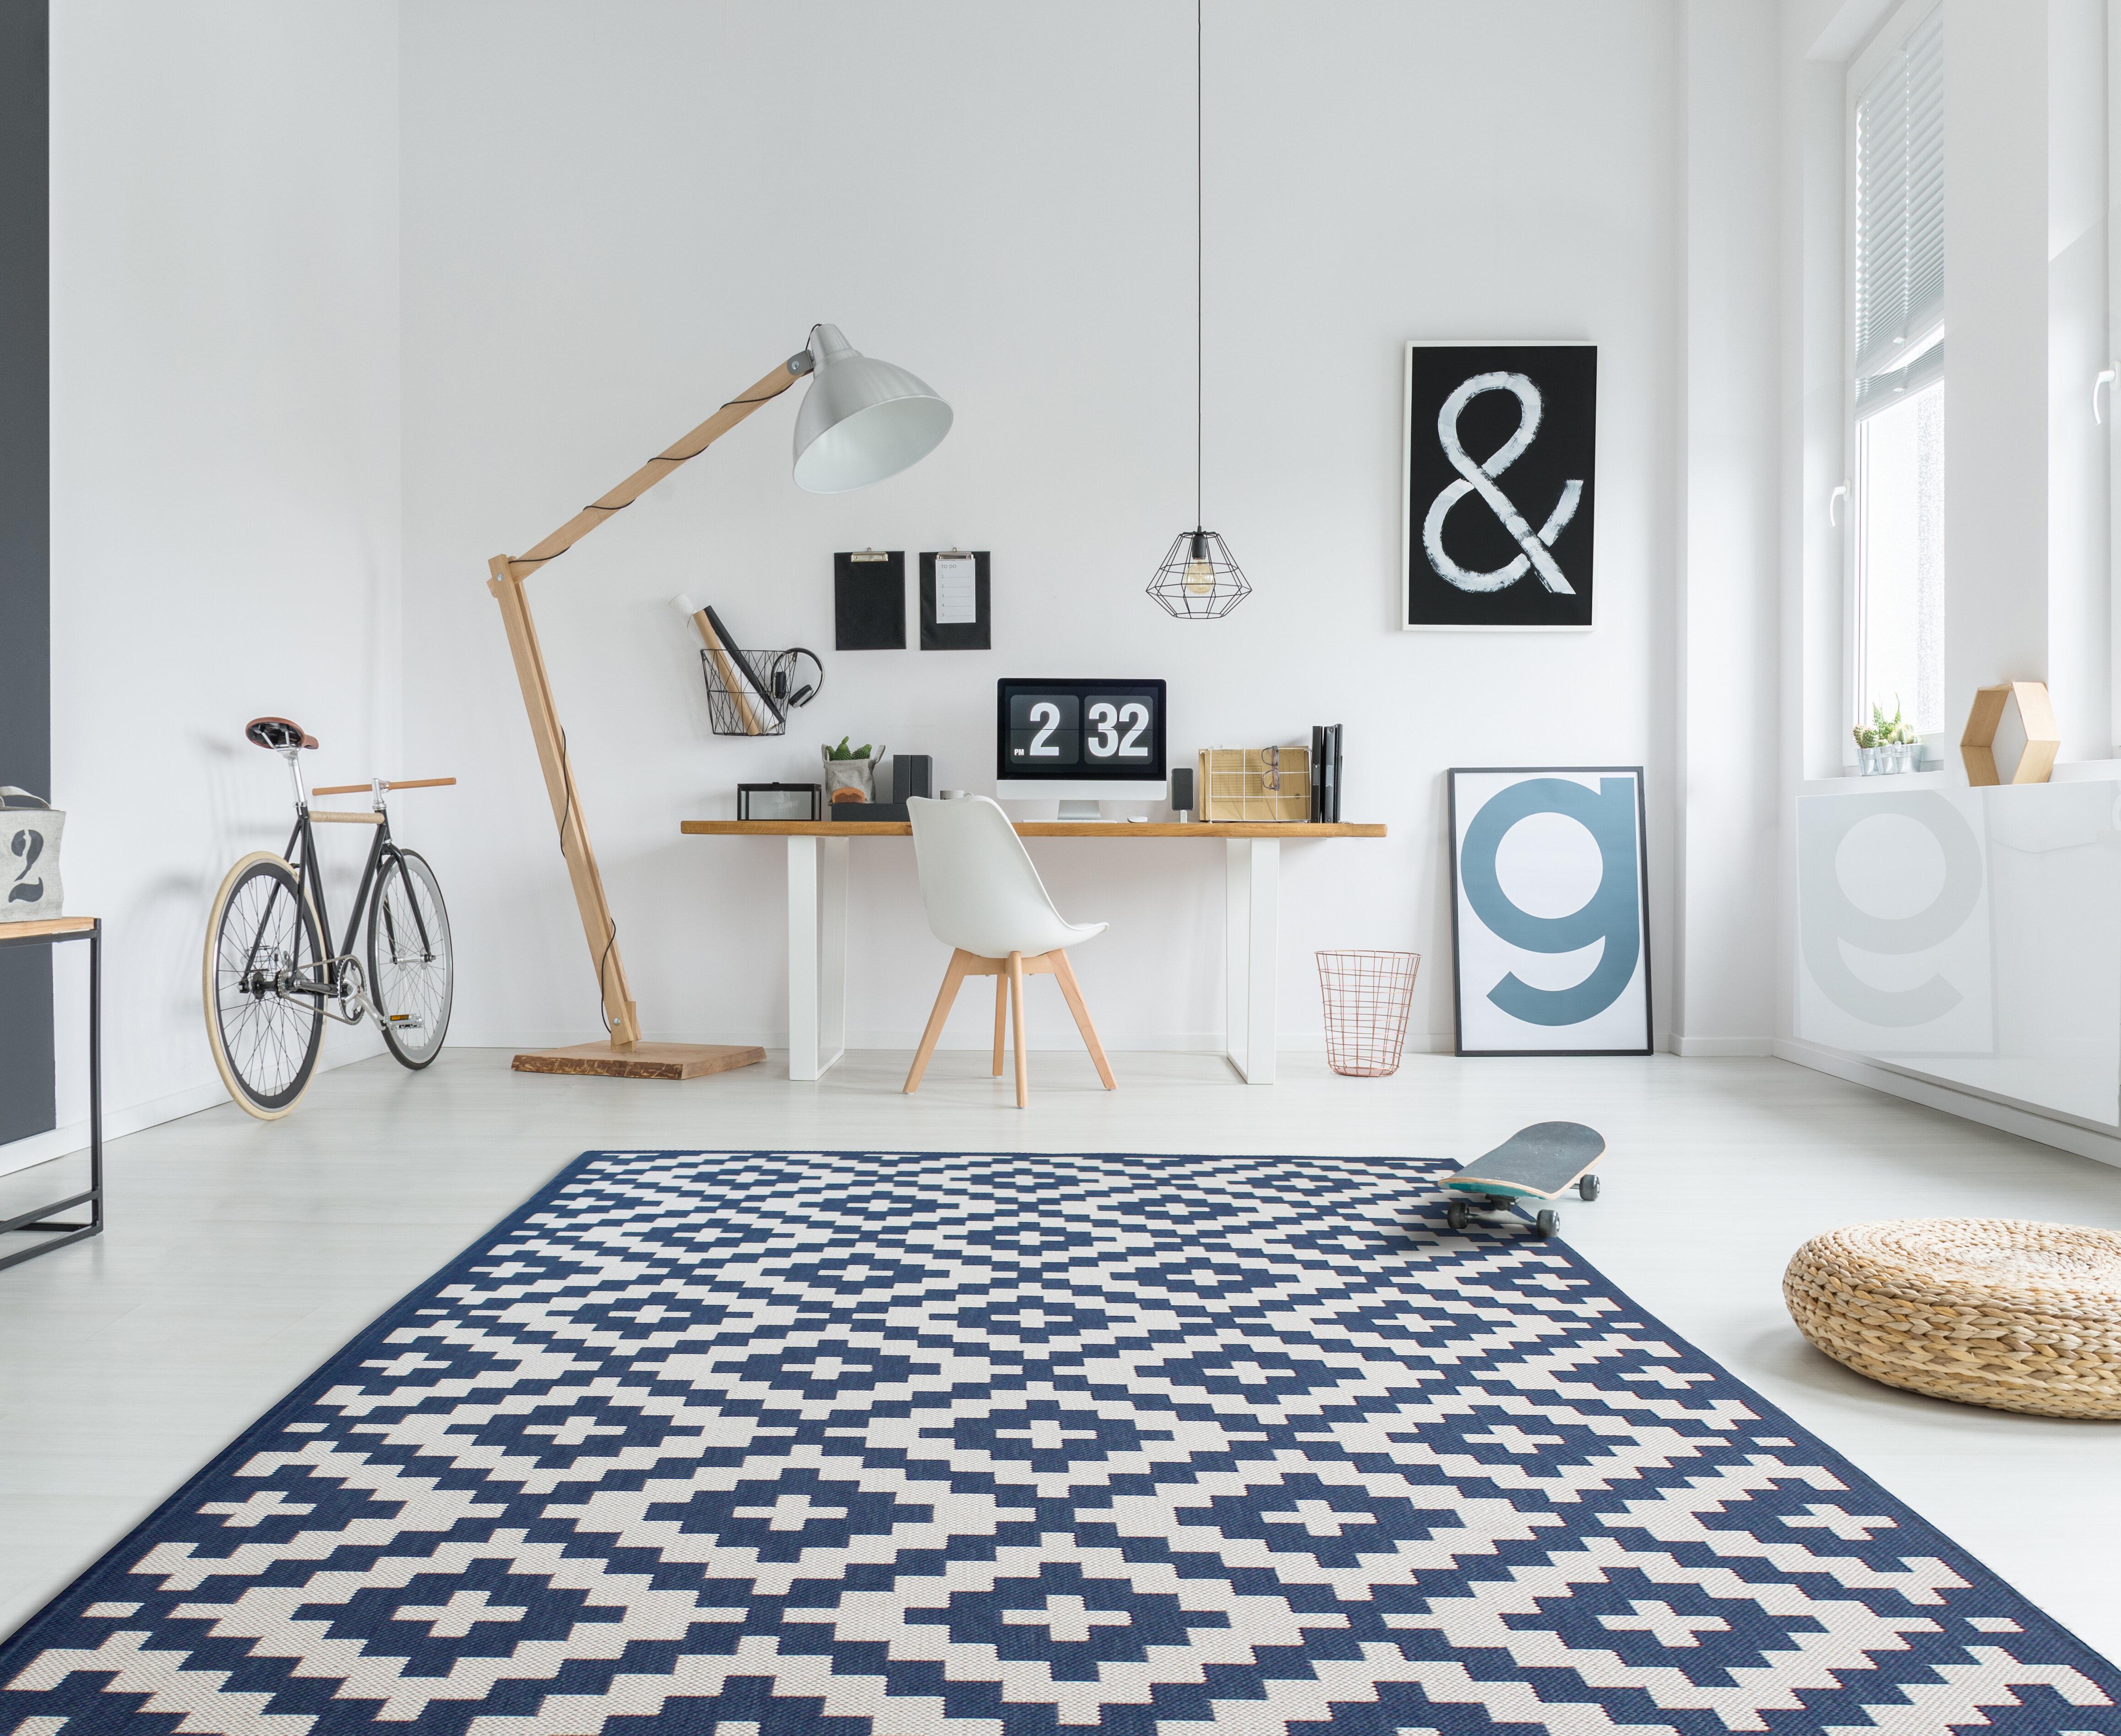 Deckland Moroccan Trellis Blue White